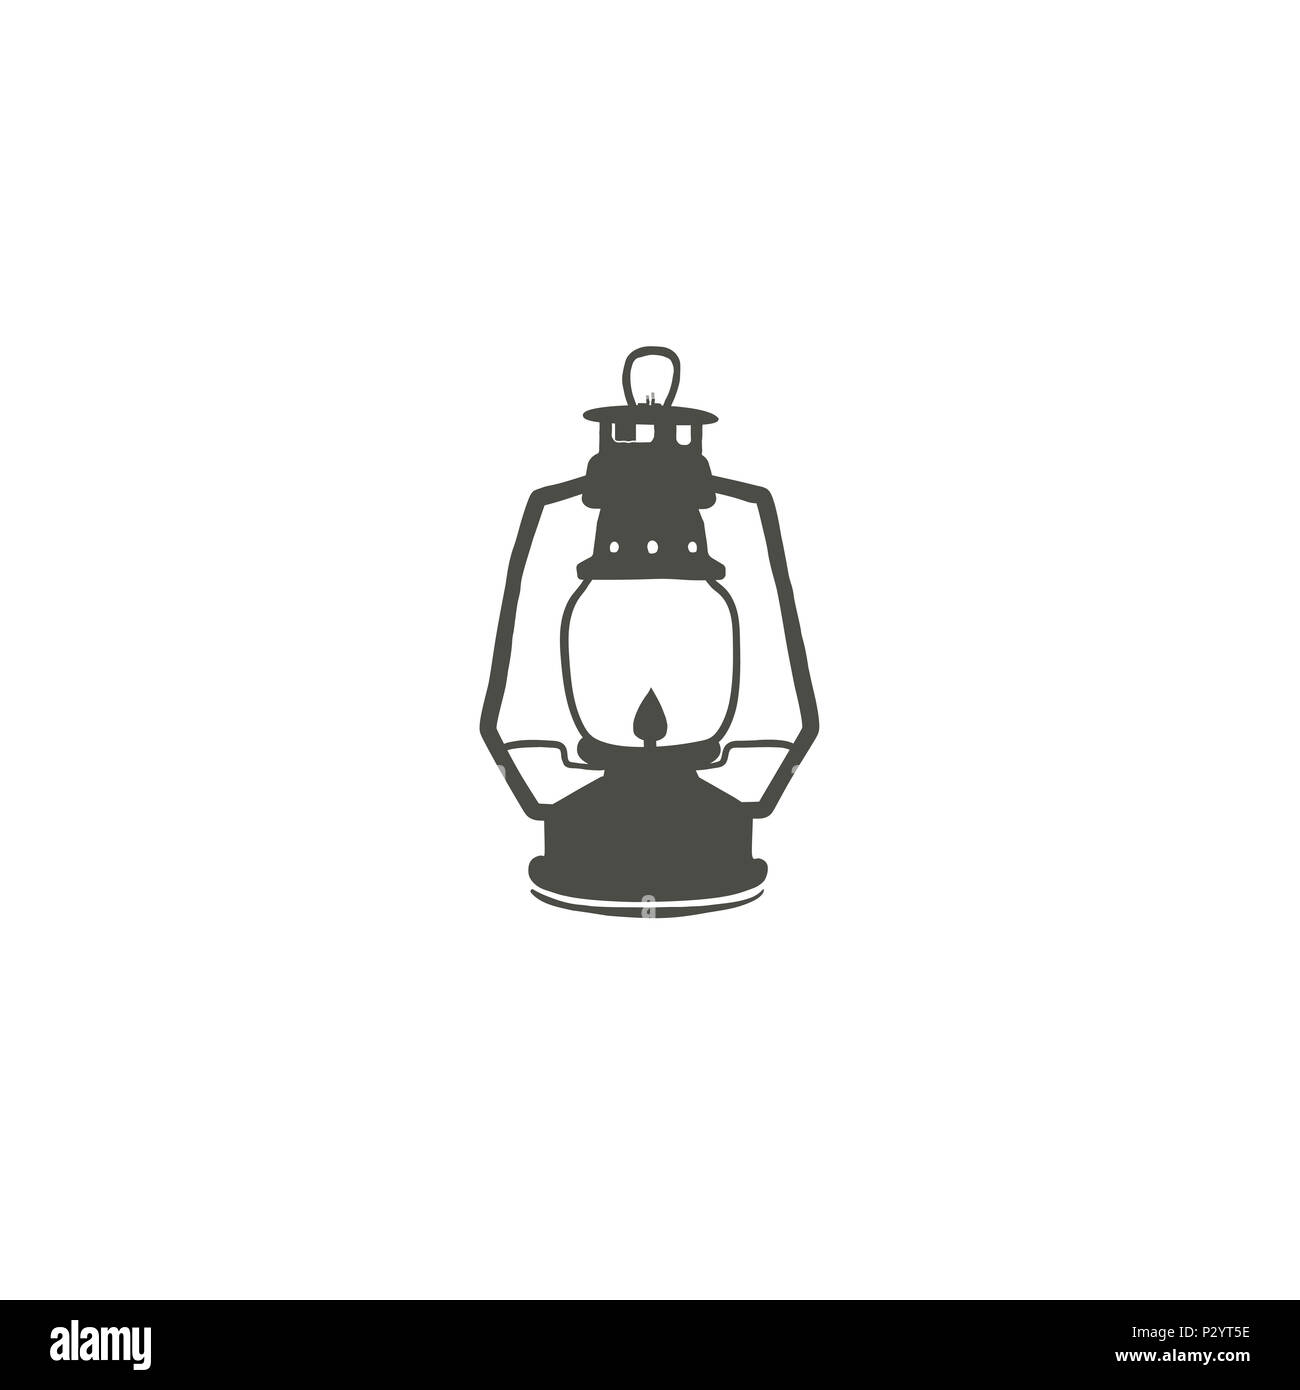 Camping Lantern Icon Silhouette Oil Lamp Black Symbol Pictogram Stock Illustration Isolated